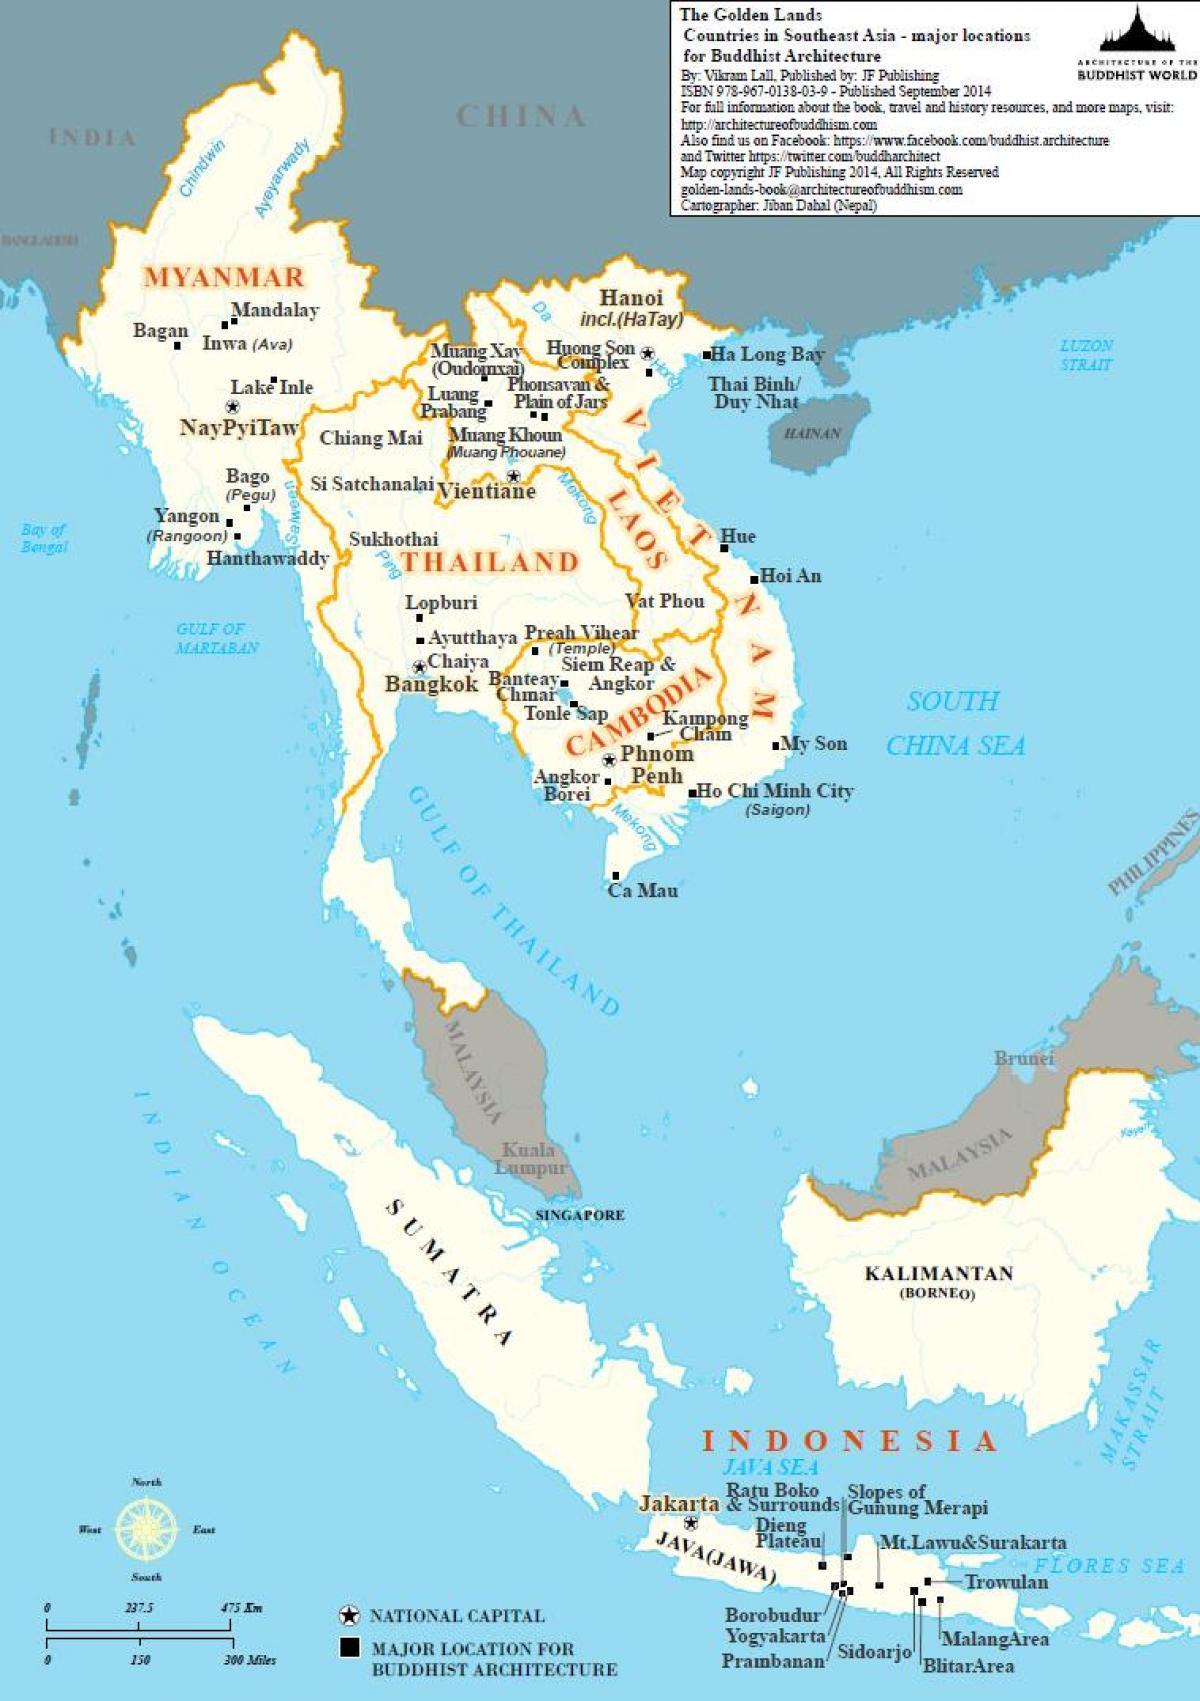 Myanmar Sydost Asien Kort Kort Over Myanmar Sydostasien Syd